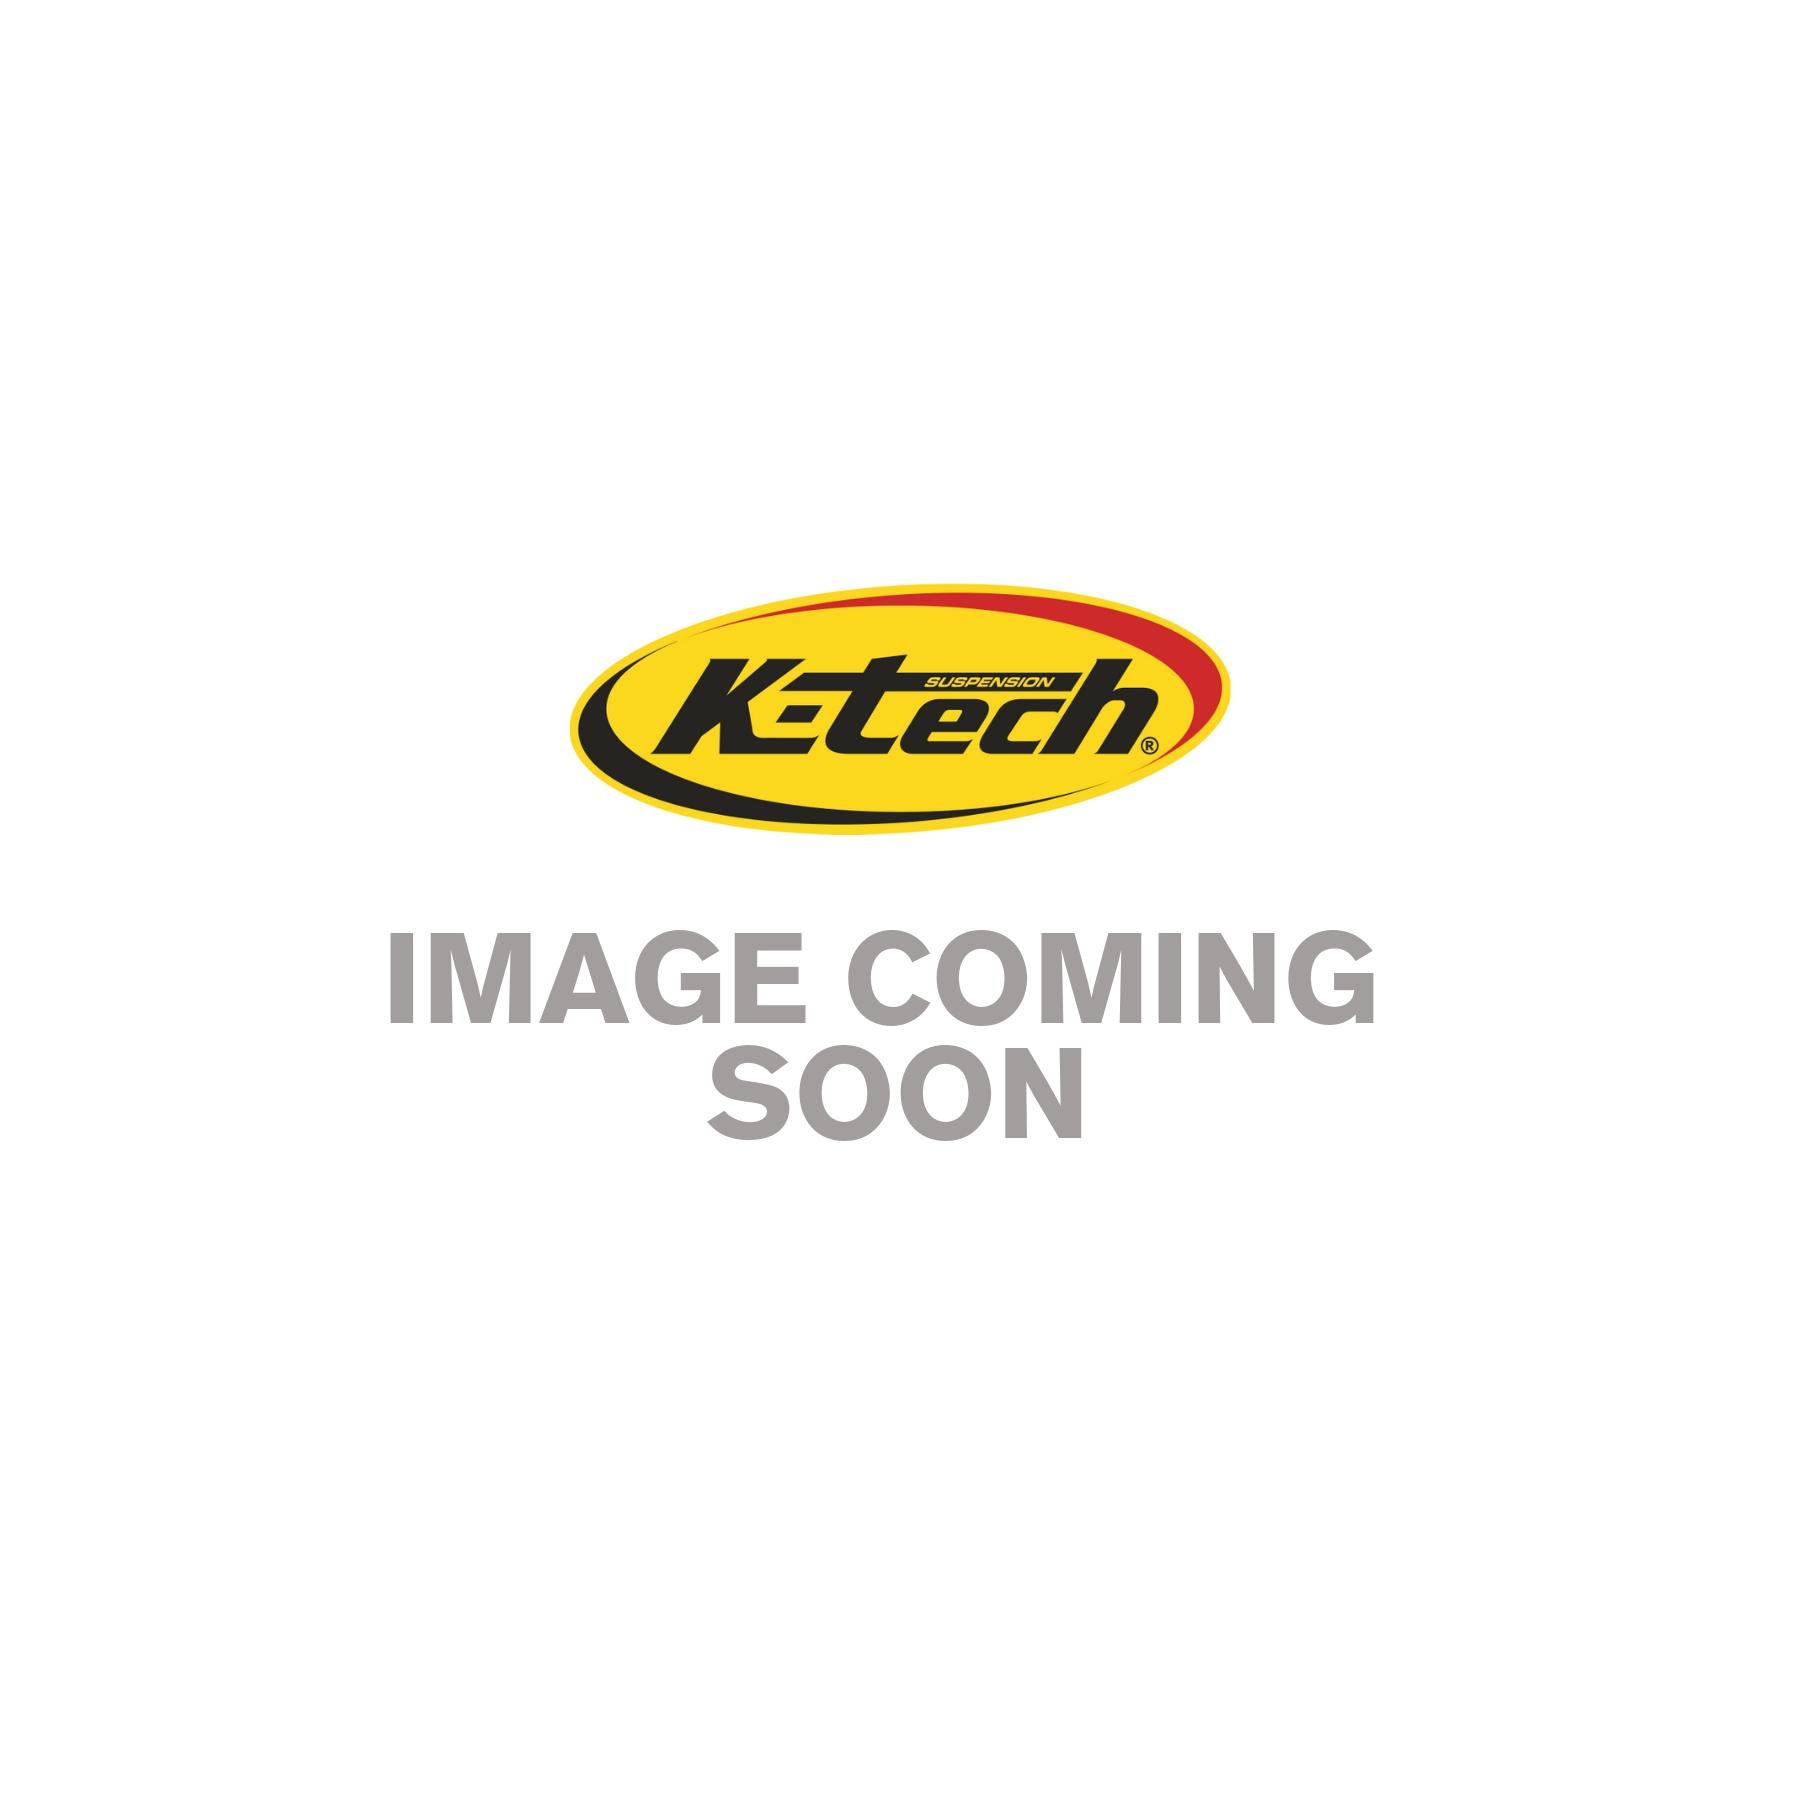 FRONT FORK OIL K-TECH HIGH PERFORMANCE SAE 5w (1 ltr)